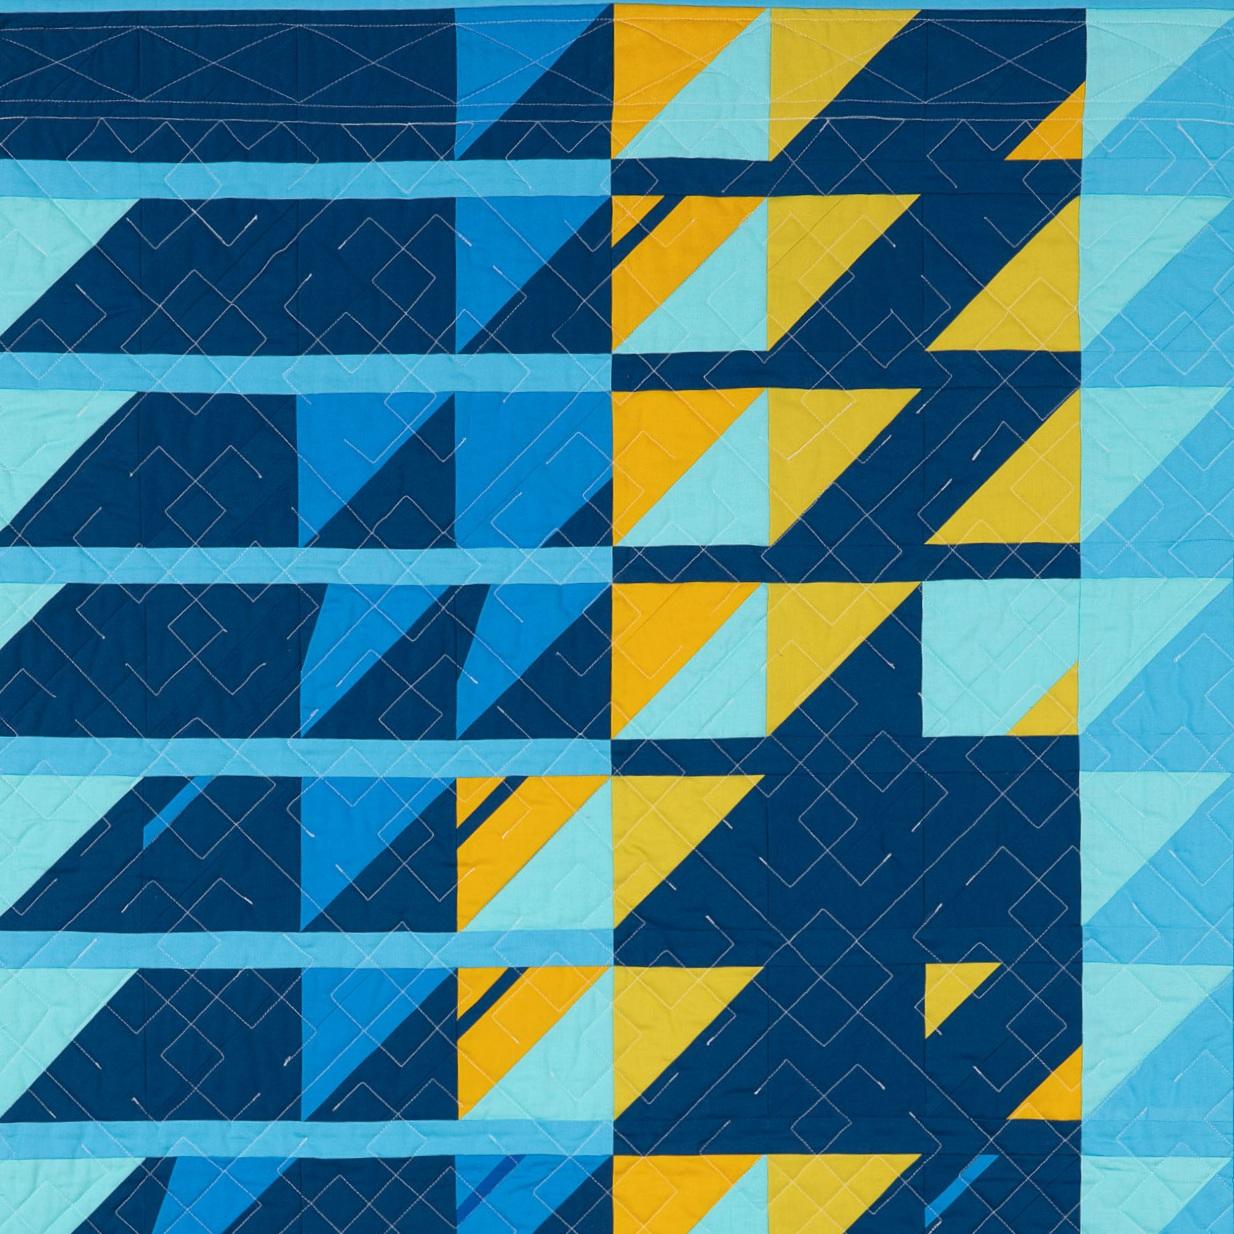 Vdol Po Travke - Sung BY Tatiana Khvastunova, Tatiana Panova, Ekaterina Kharlanova, Tatiana Golvskaya - Arkhangelsk, russia 2017Designed, pieced, and quilted by EHJ 2017